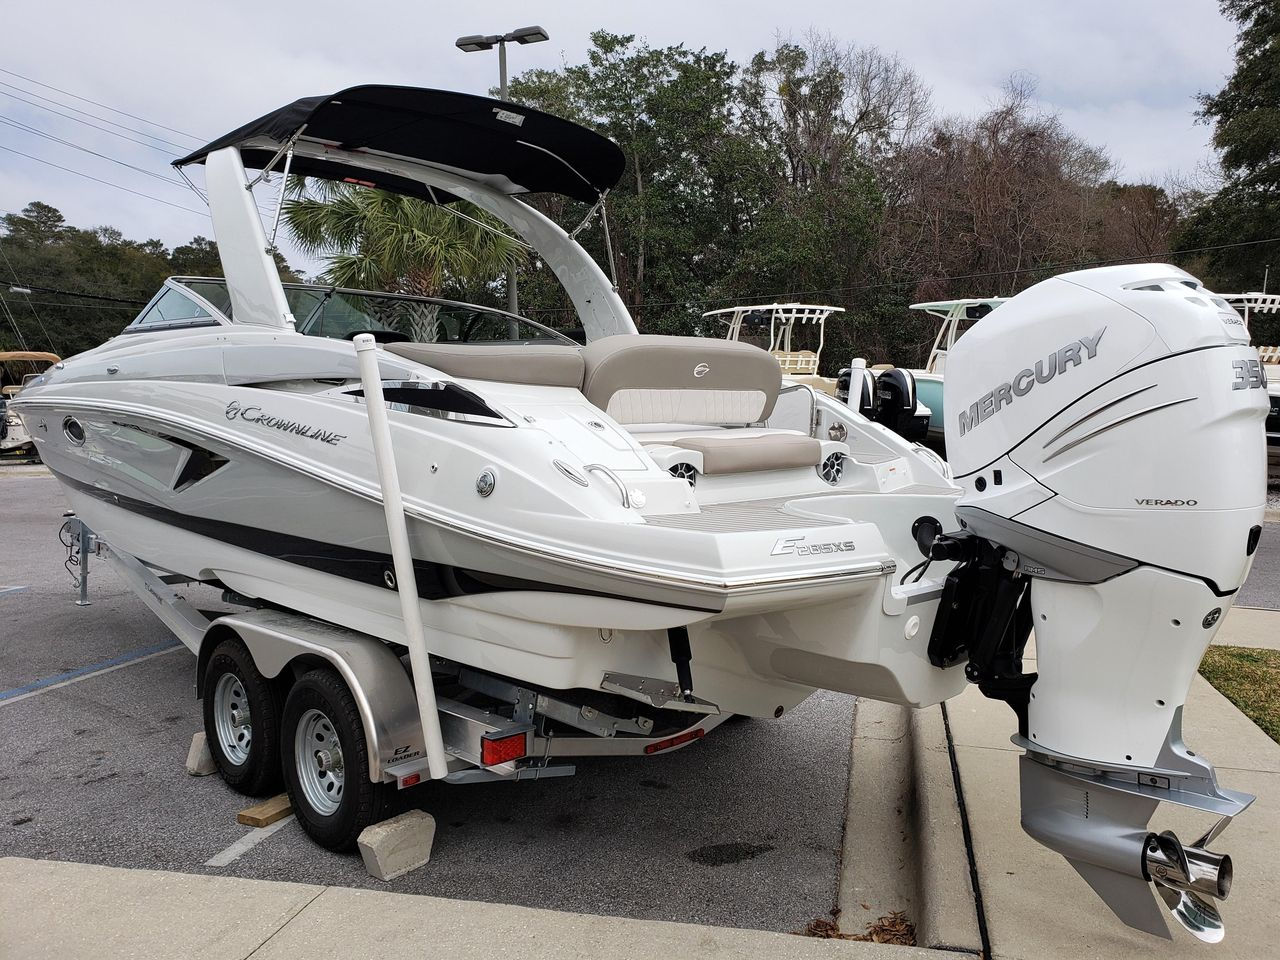 2019 New Crownline Eclipse E285 XS Bowrider Boat For Sale